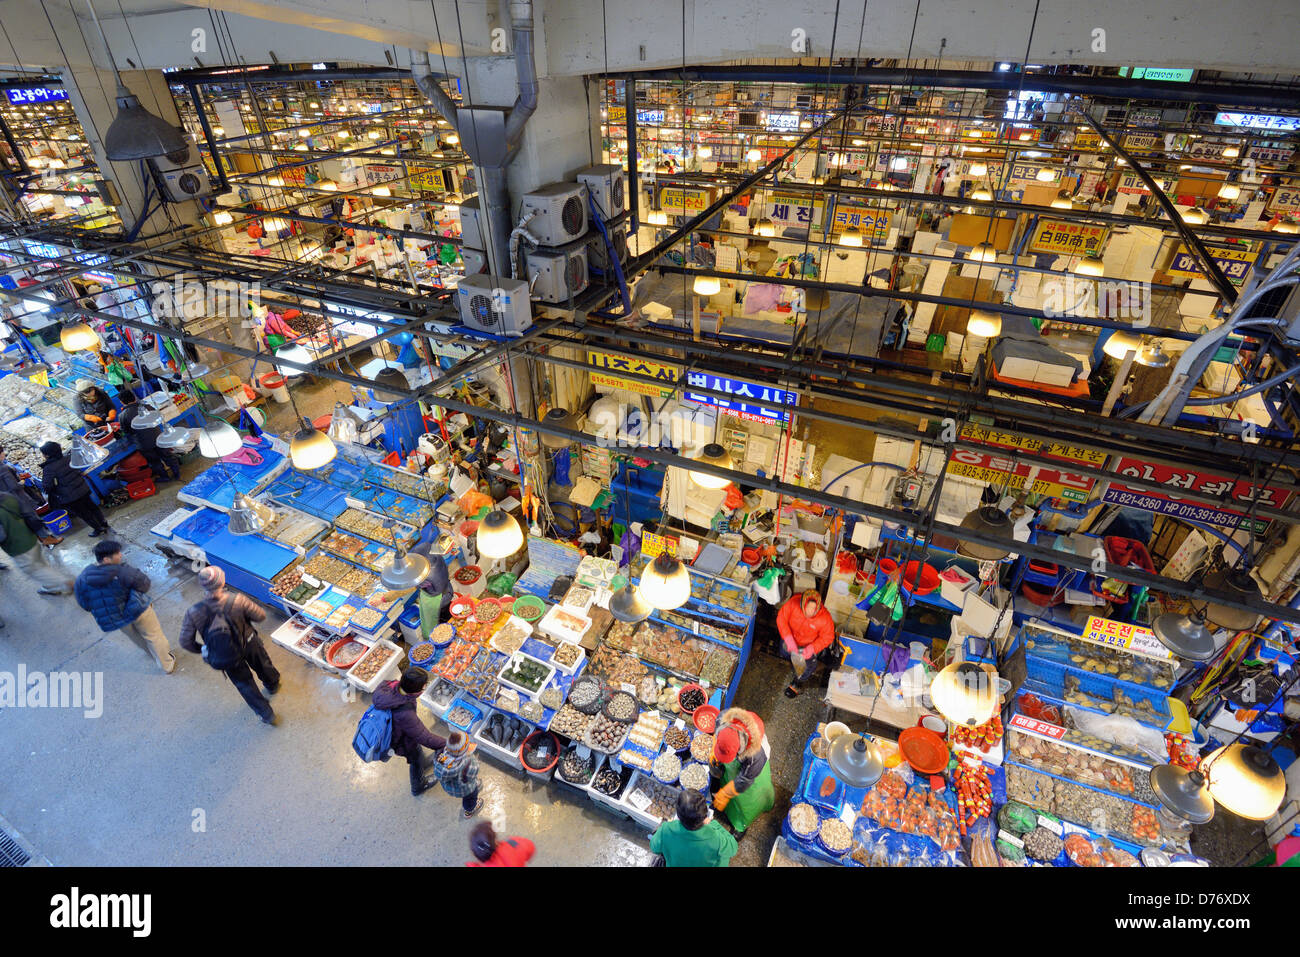 Noryangjin Mercado Mayorista Pesquero en Seúl, Corea del Sur Imagen De Stock